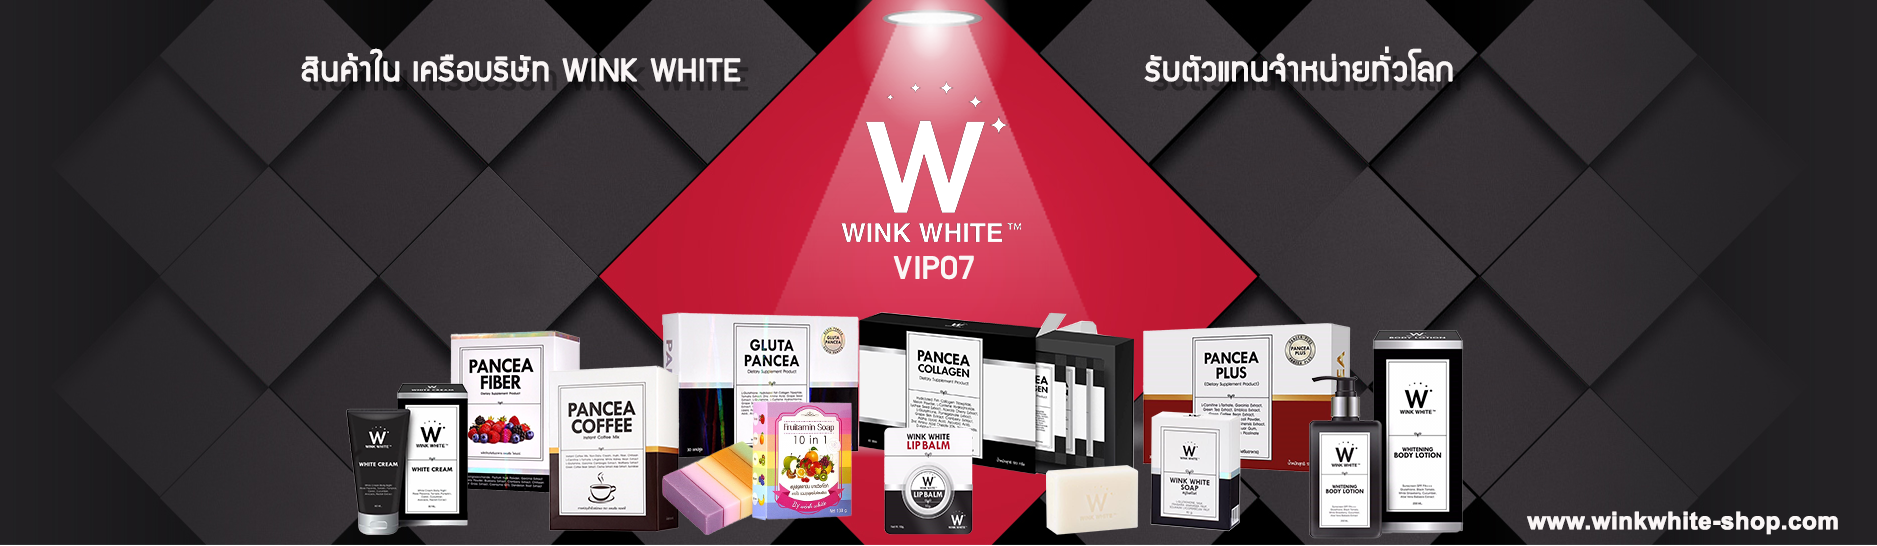 VIP Winkwhite Thailand